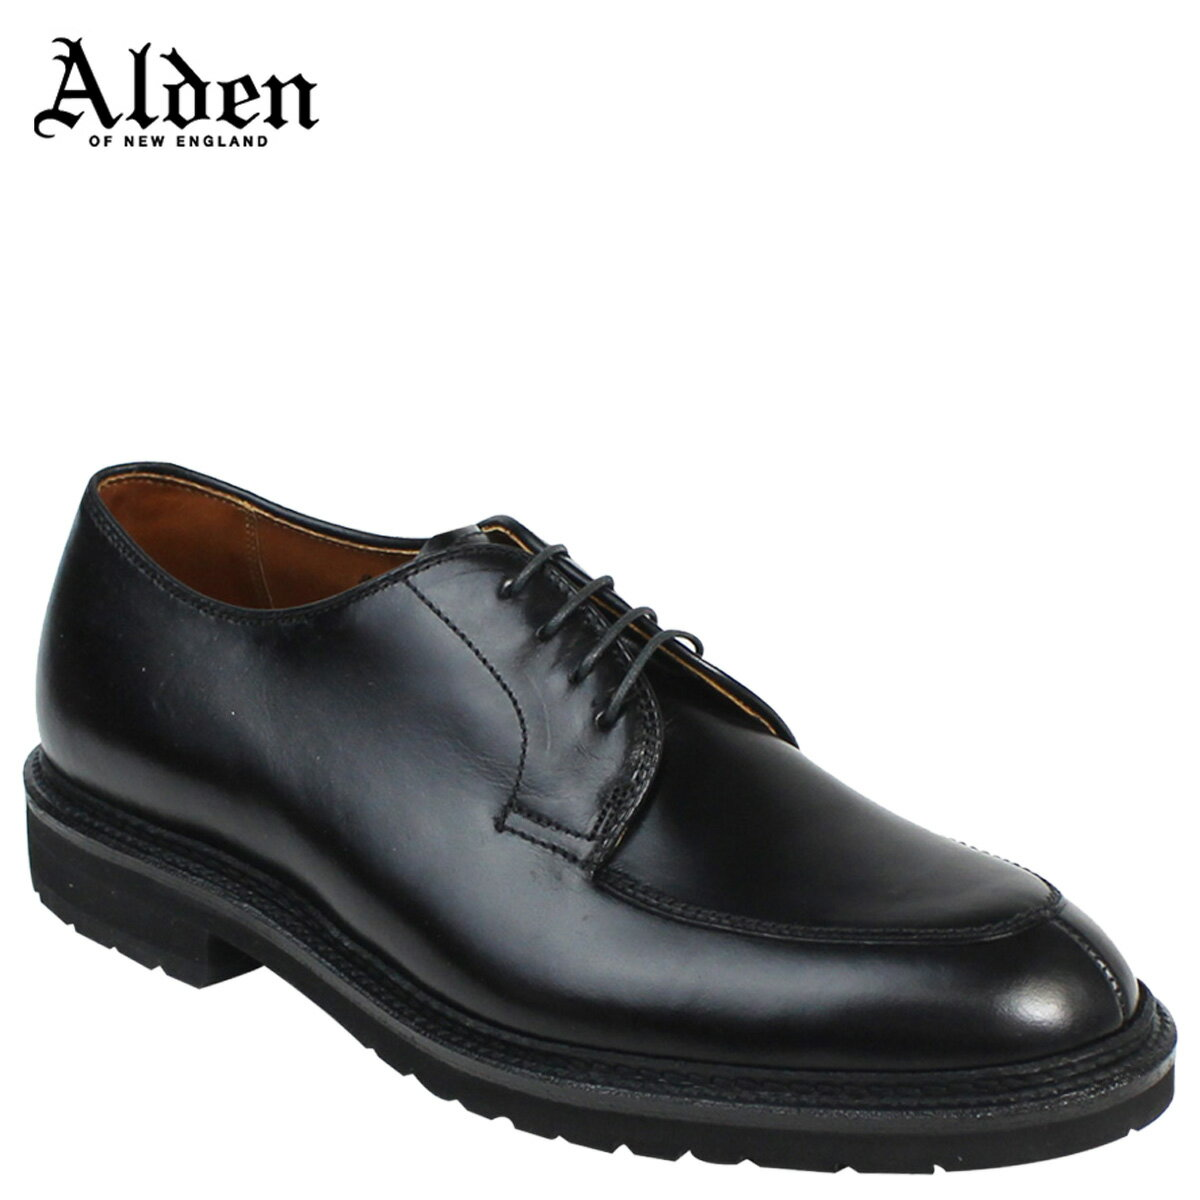 ALDEN オールデン シューズ メンズ MOCC TOE BLUCHER Dワイズ 7117S